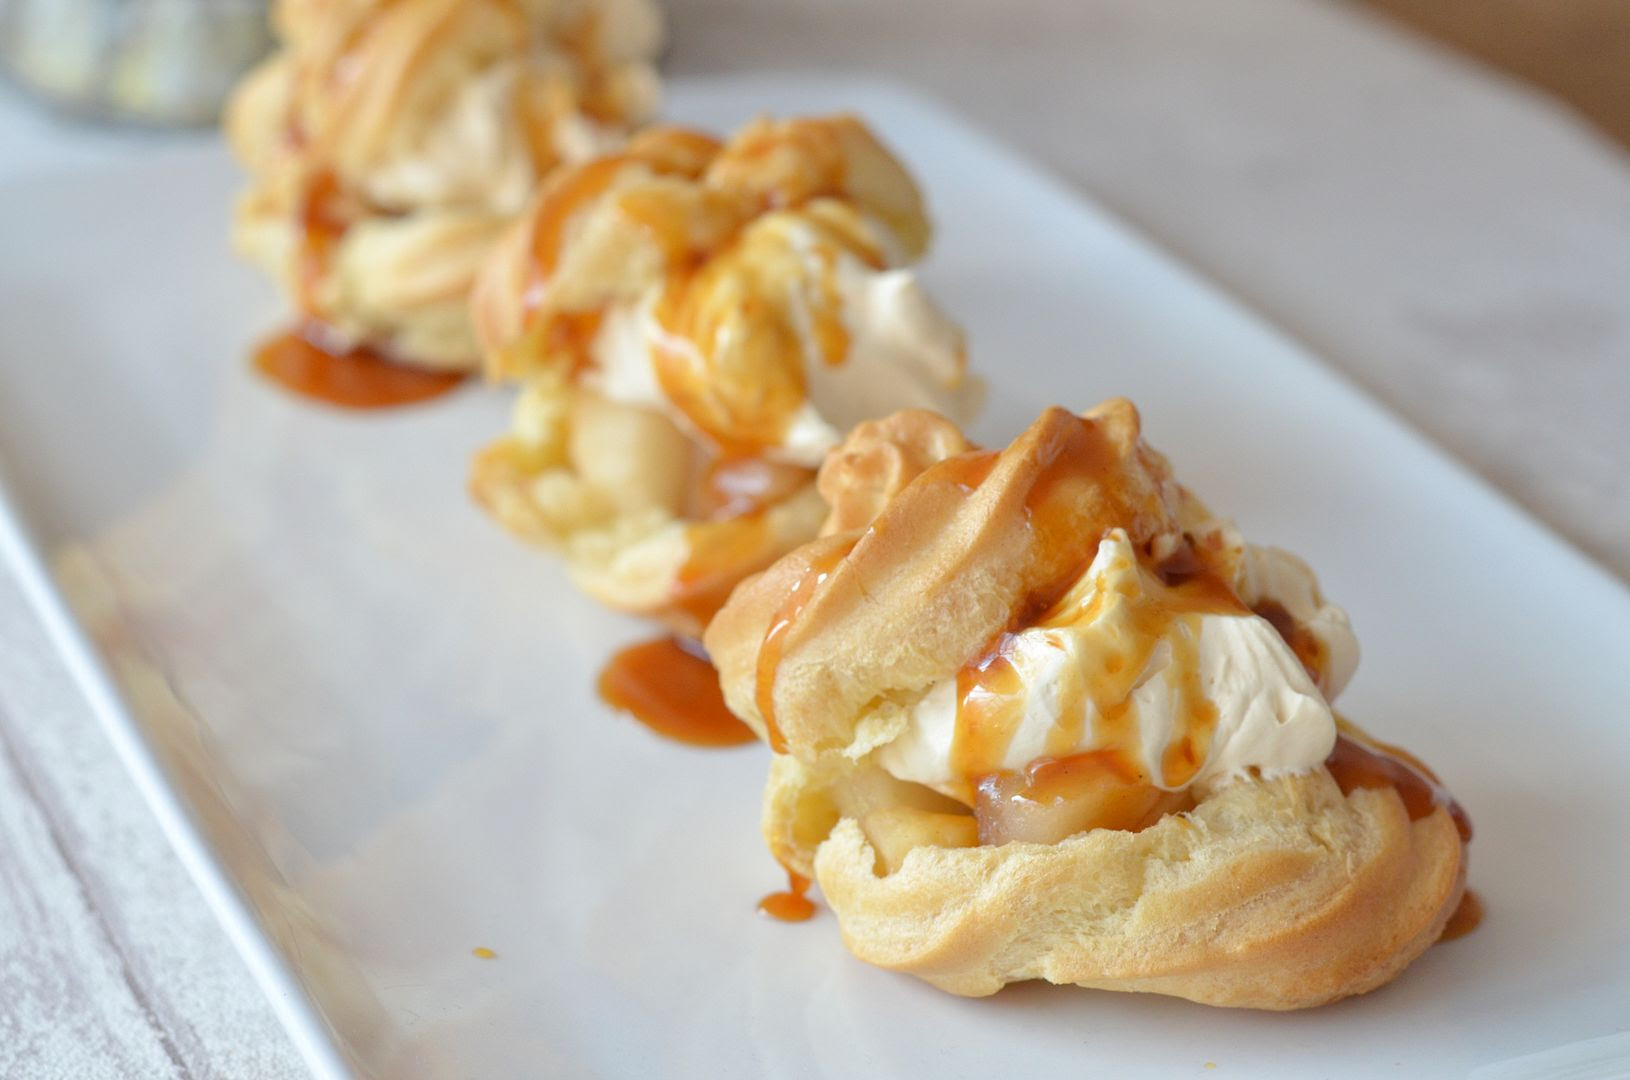 Caramel Apple Choux Buns